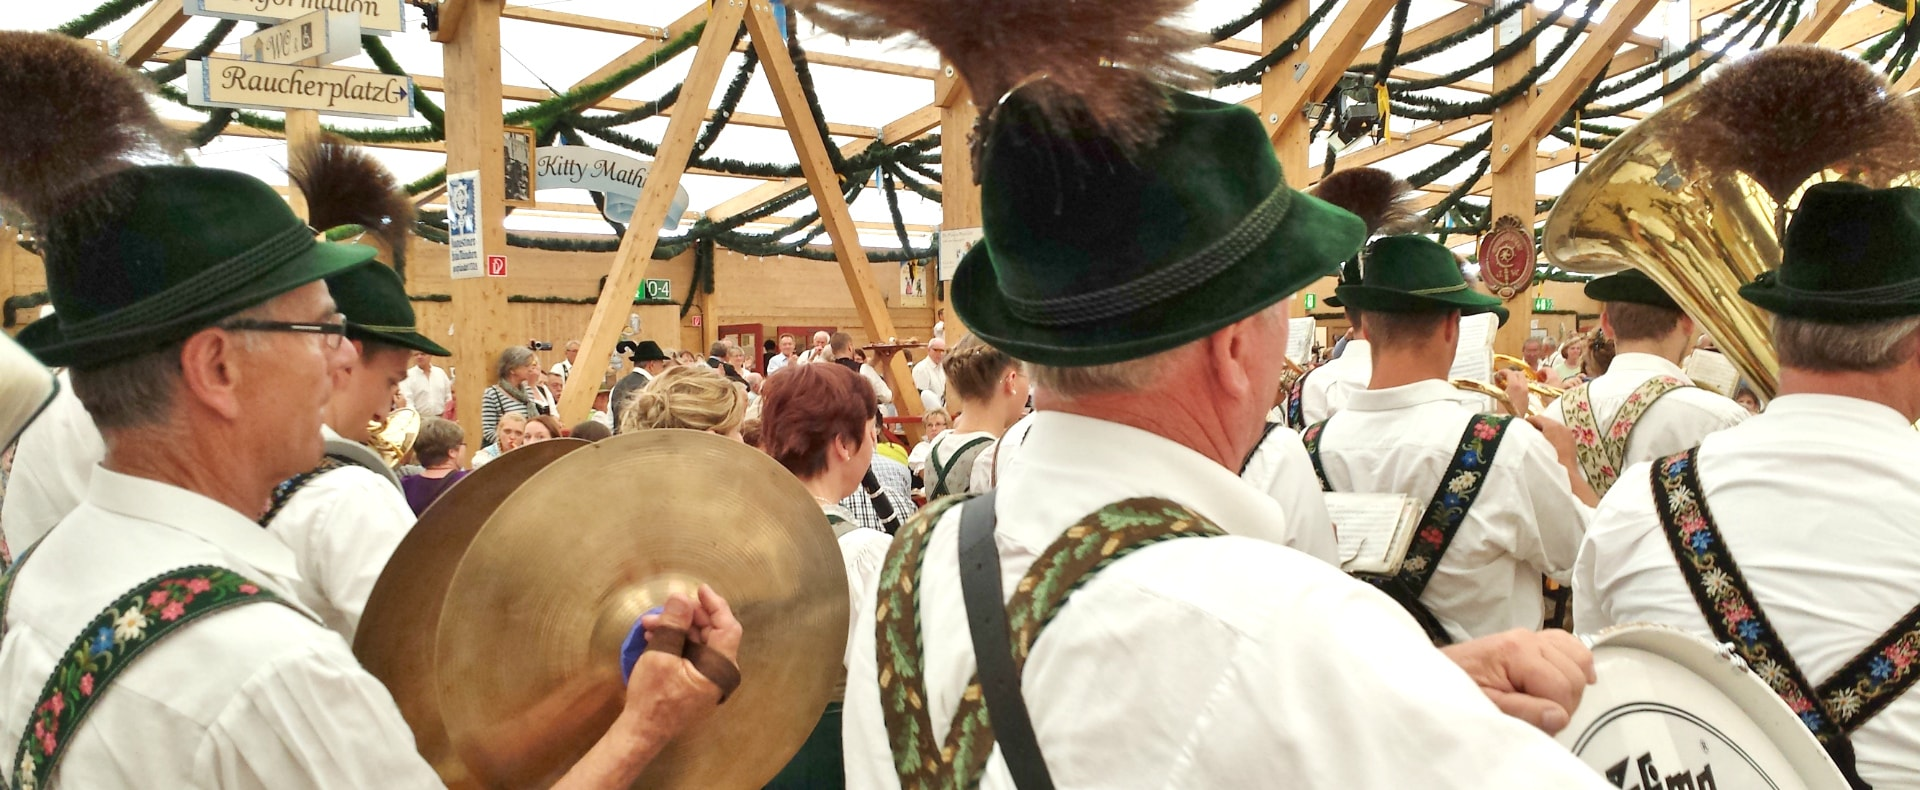 Oktoberfest, Germany